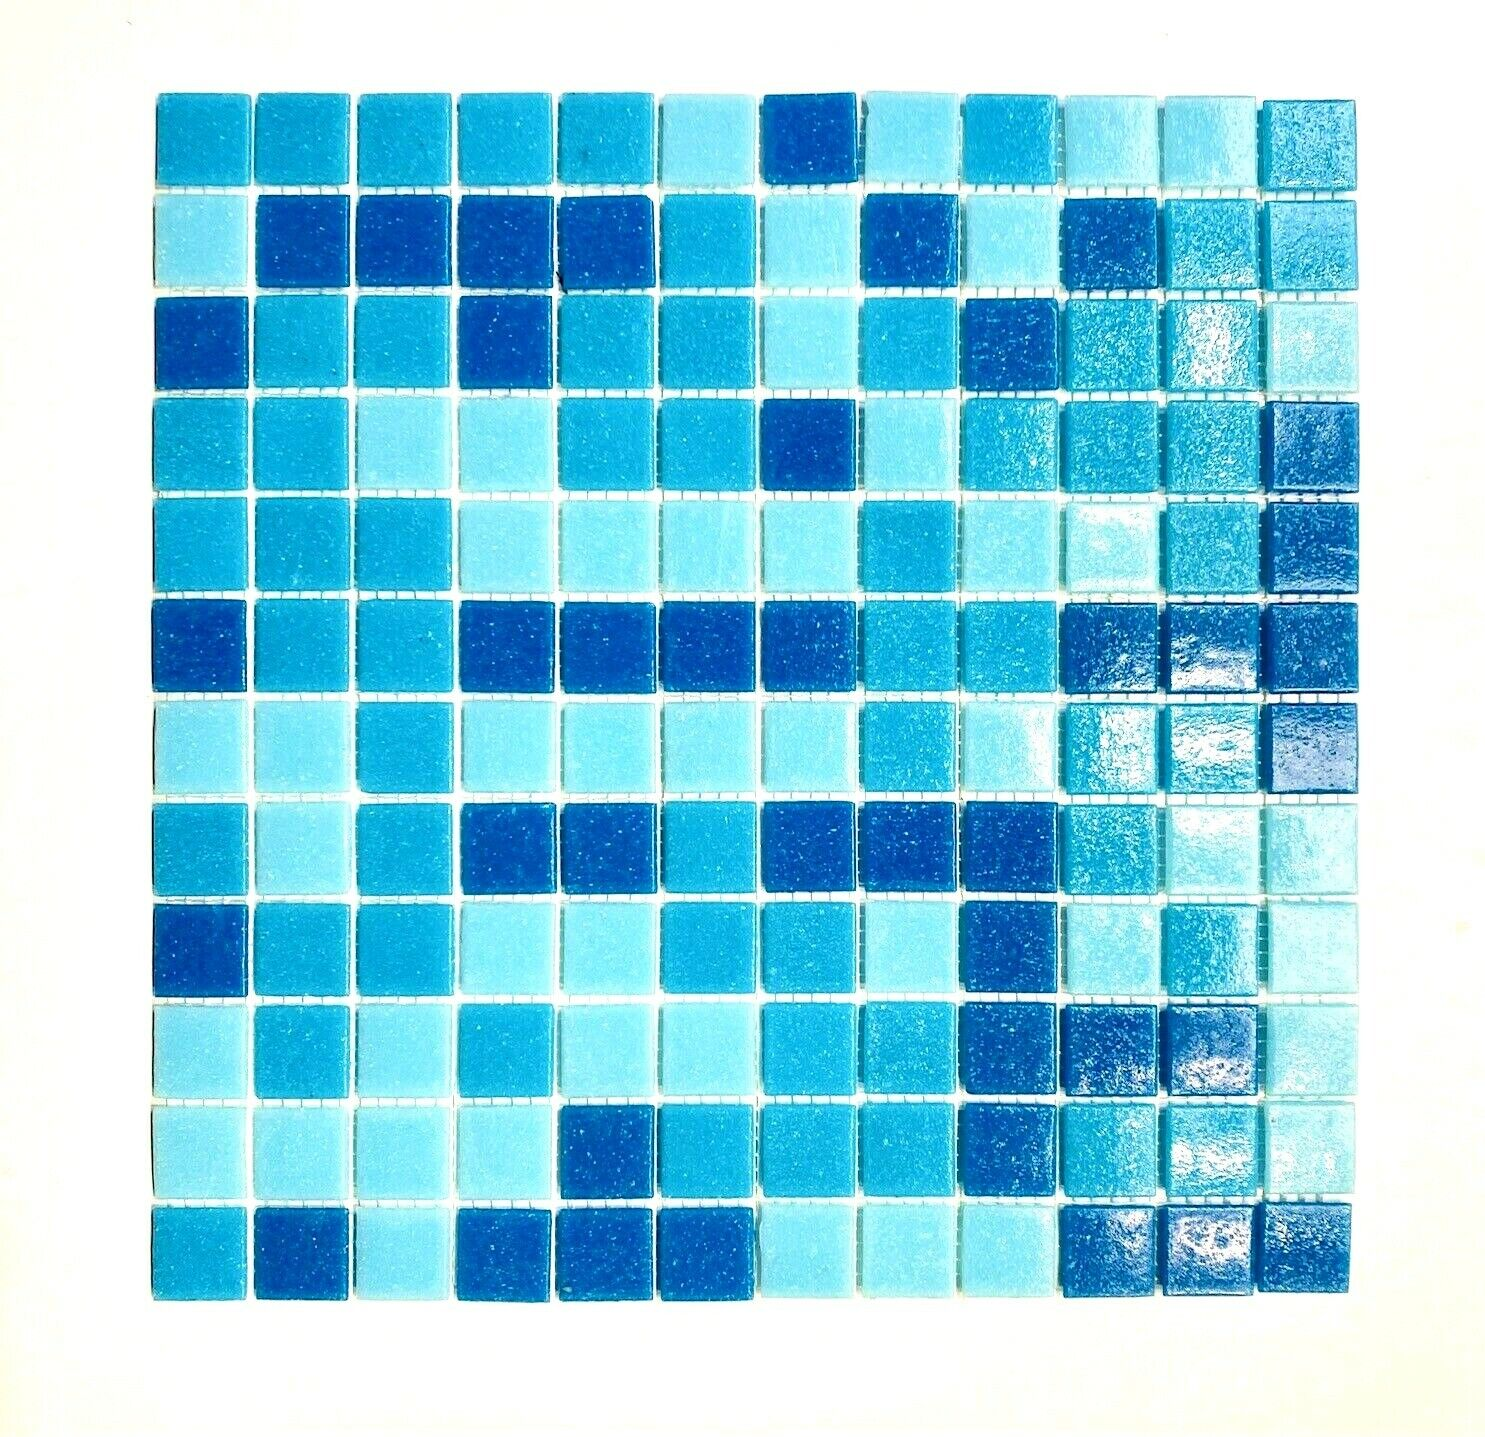 1x1 Pool Blue Spa Navy mix Glass Mosaic Wall and Floor Tile Pool Backsplash